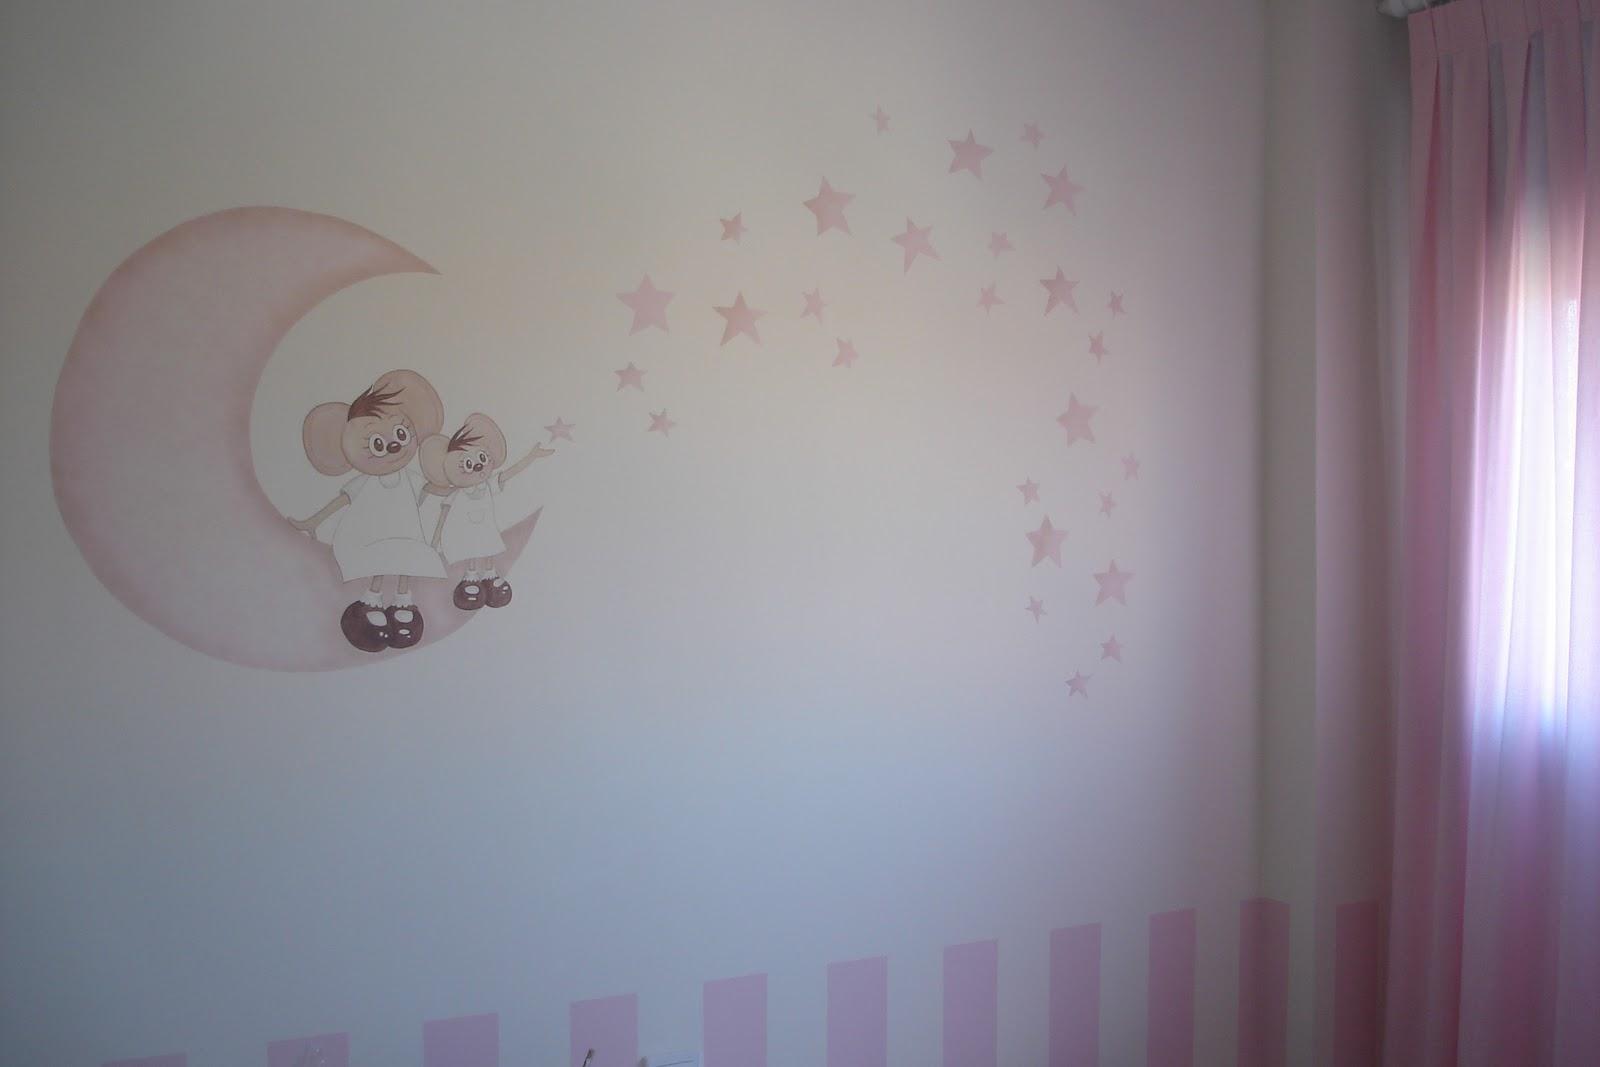 Aerografia y decoraci n habitaci n daniela - Dibujos habitacion bebe ...